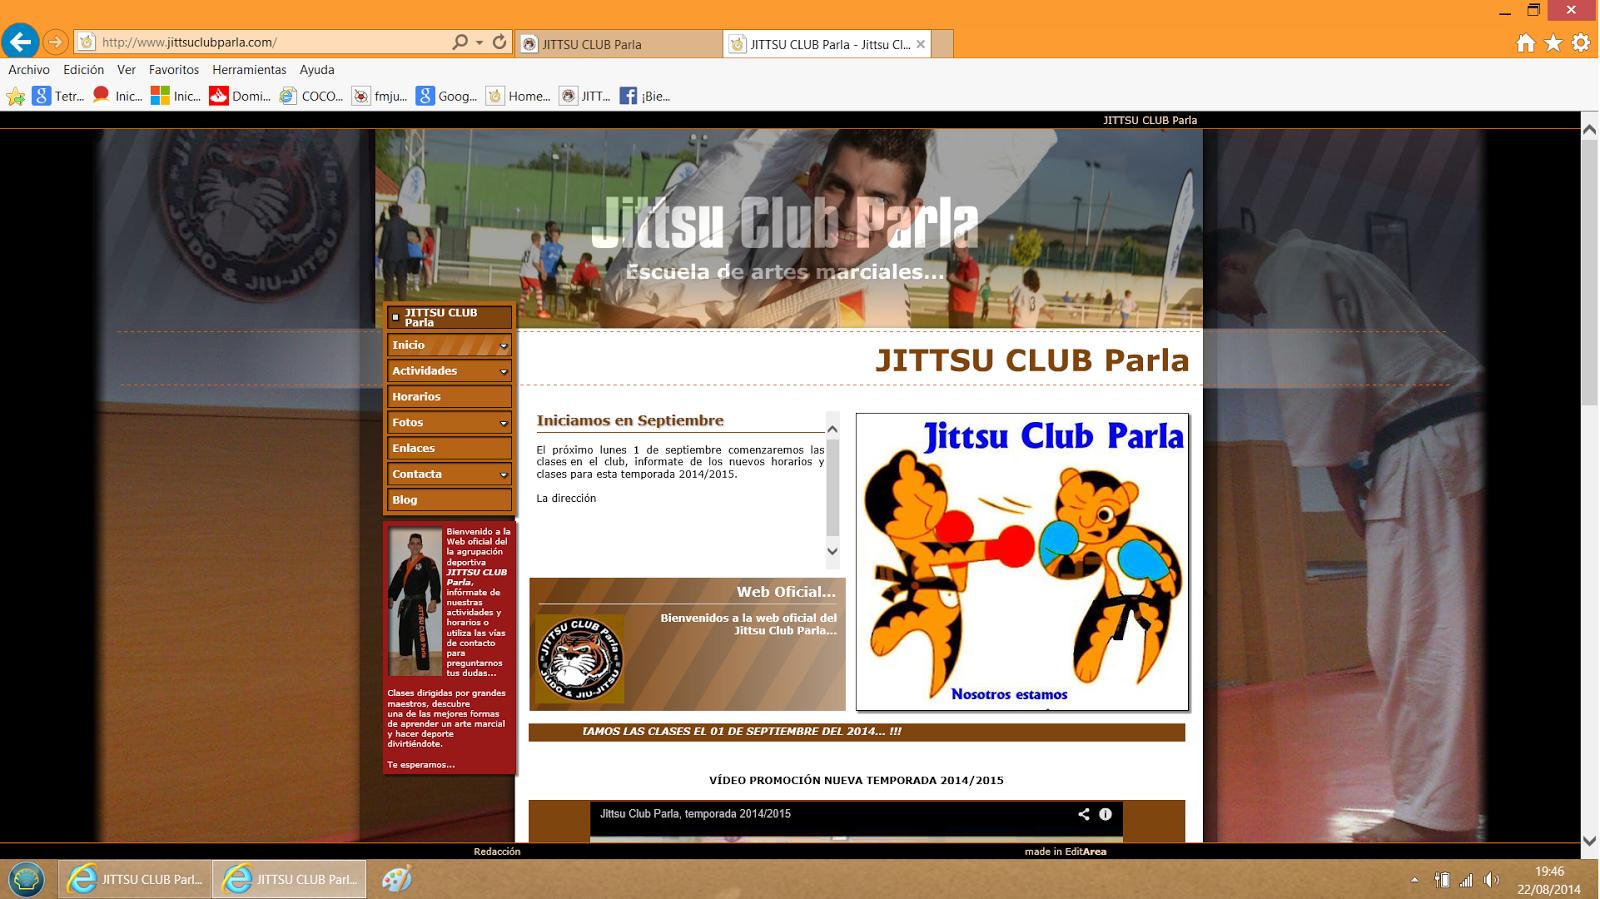 http://www.jittsuclubparla.com/